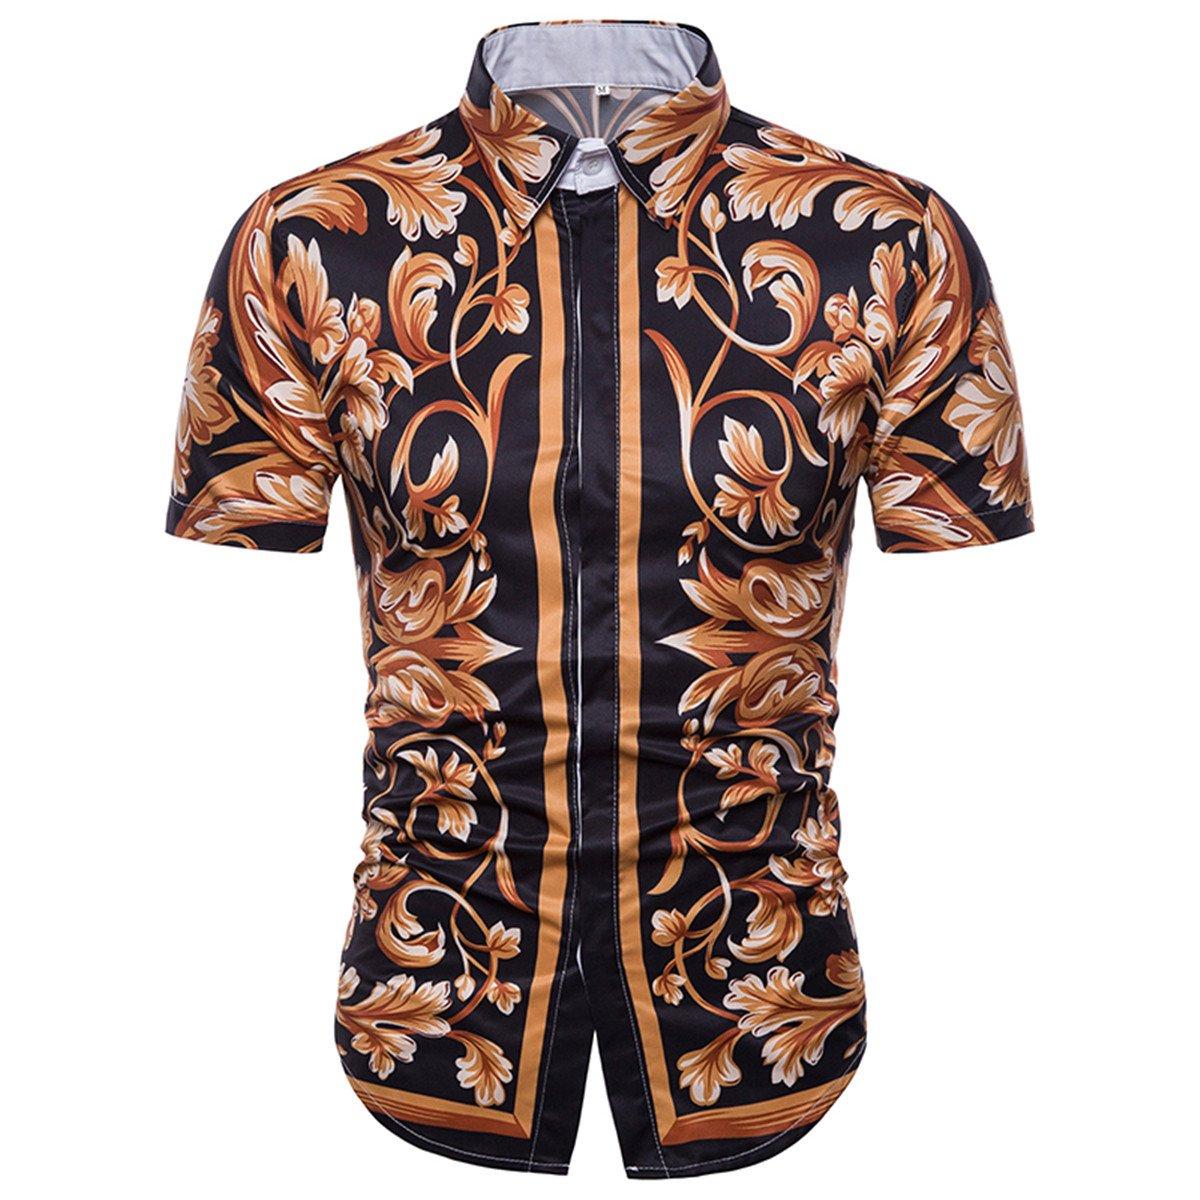 Mens Printed Button Down Casual Short-Sleeved Summer Shirt